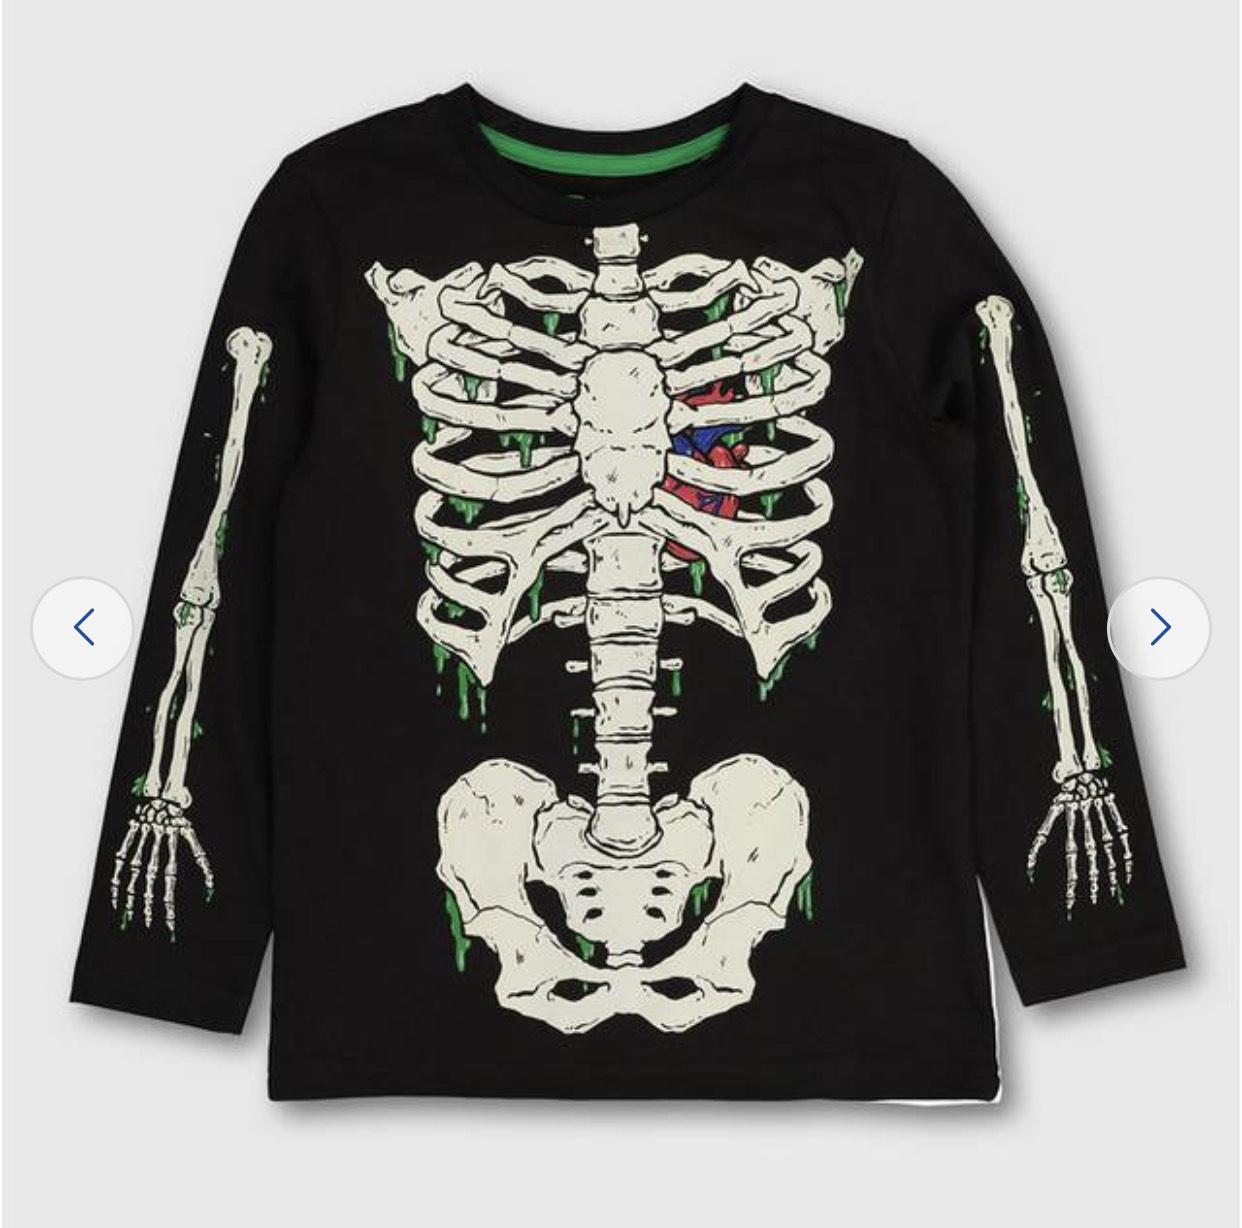 Tu clothing Halloween Skeleton Glow In The Dark Top from £3.50 @ Argos